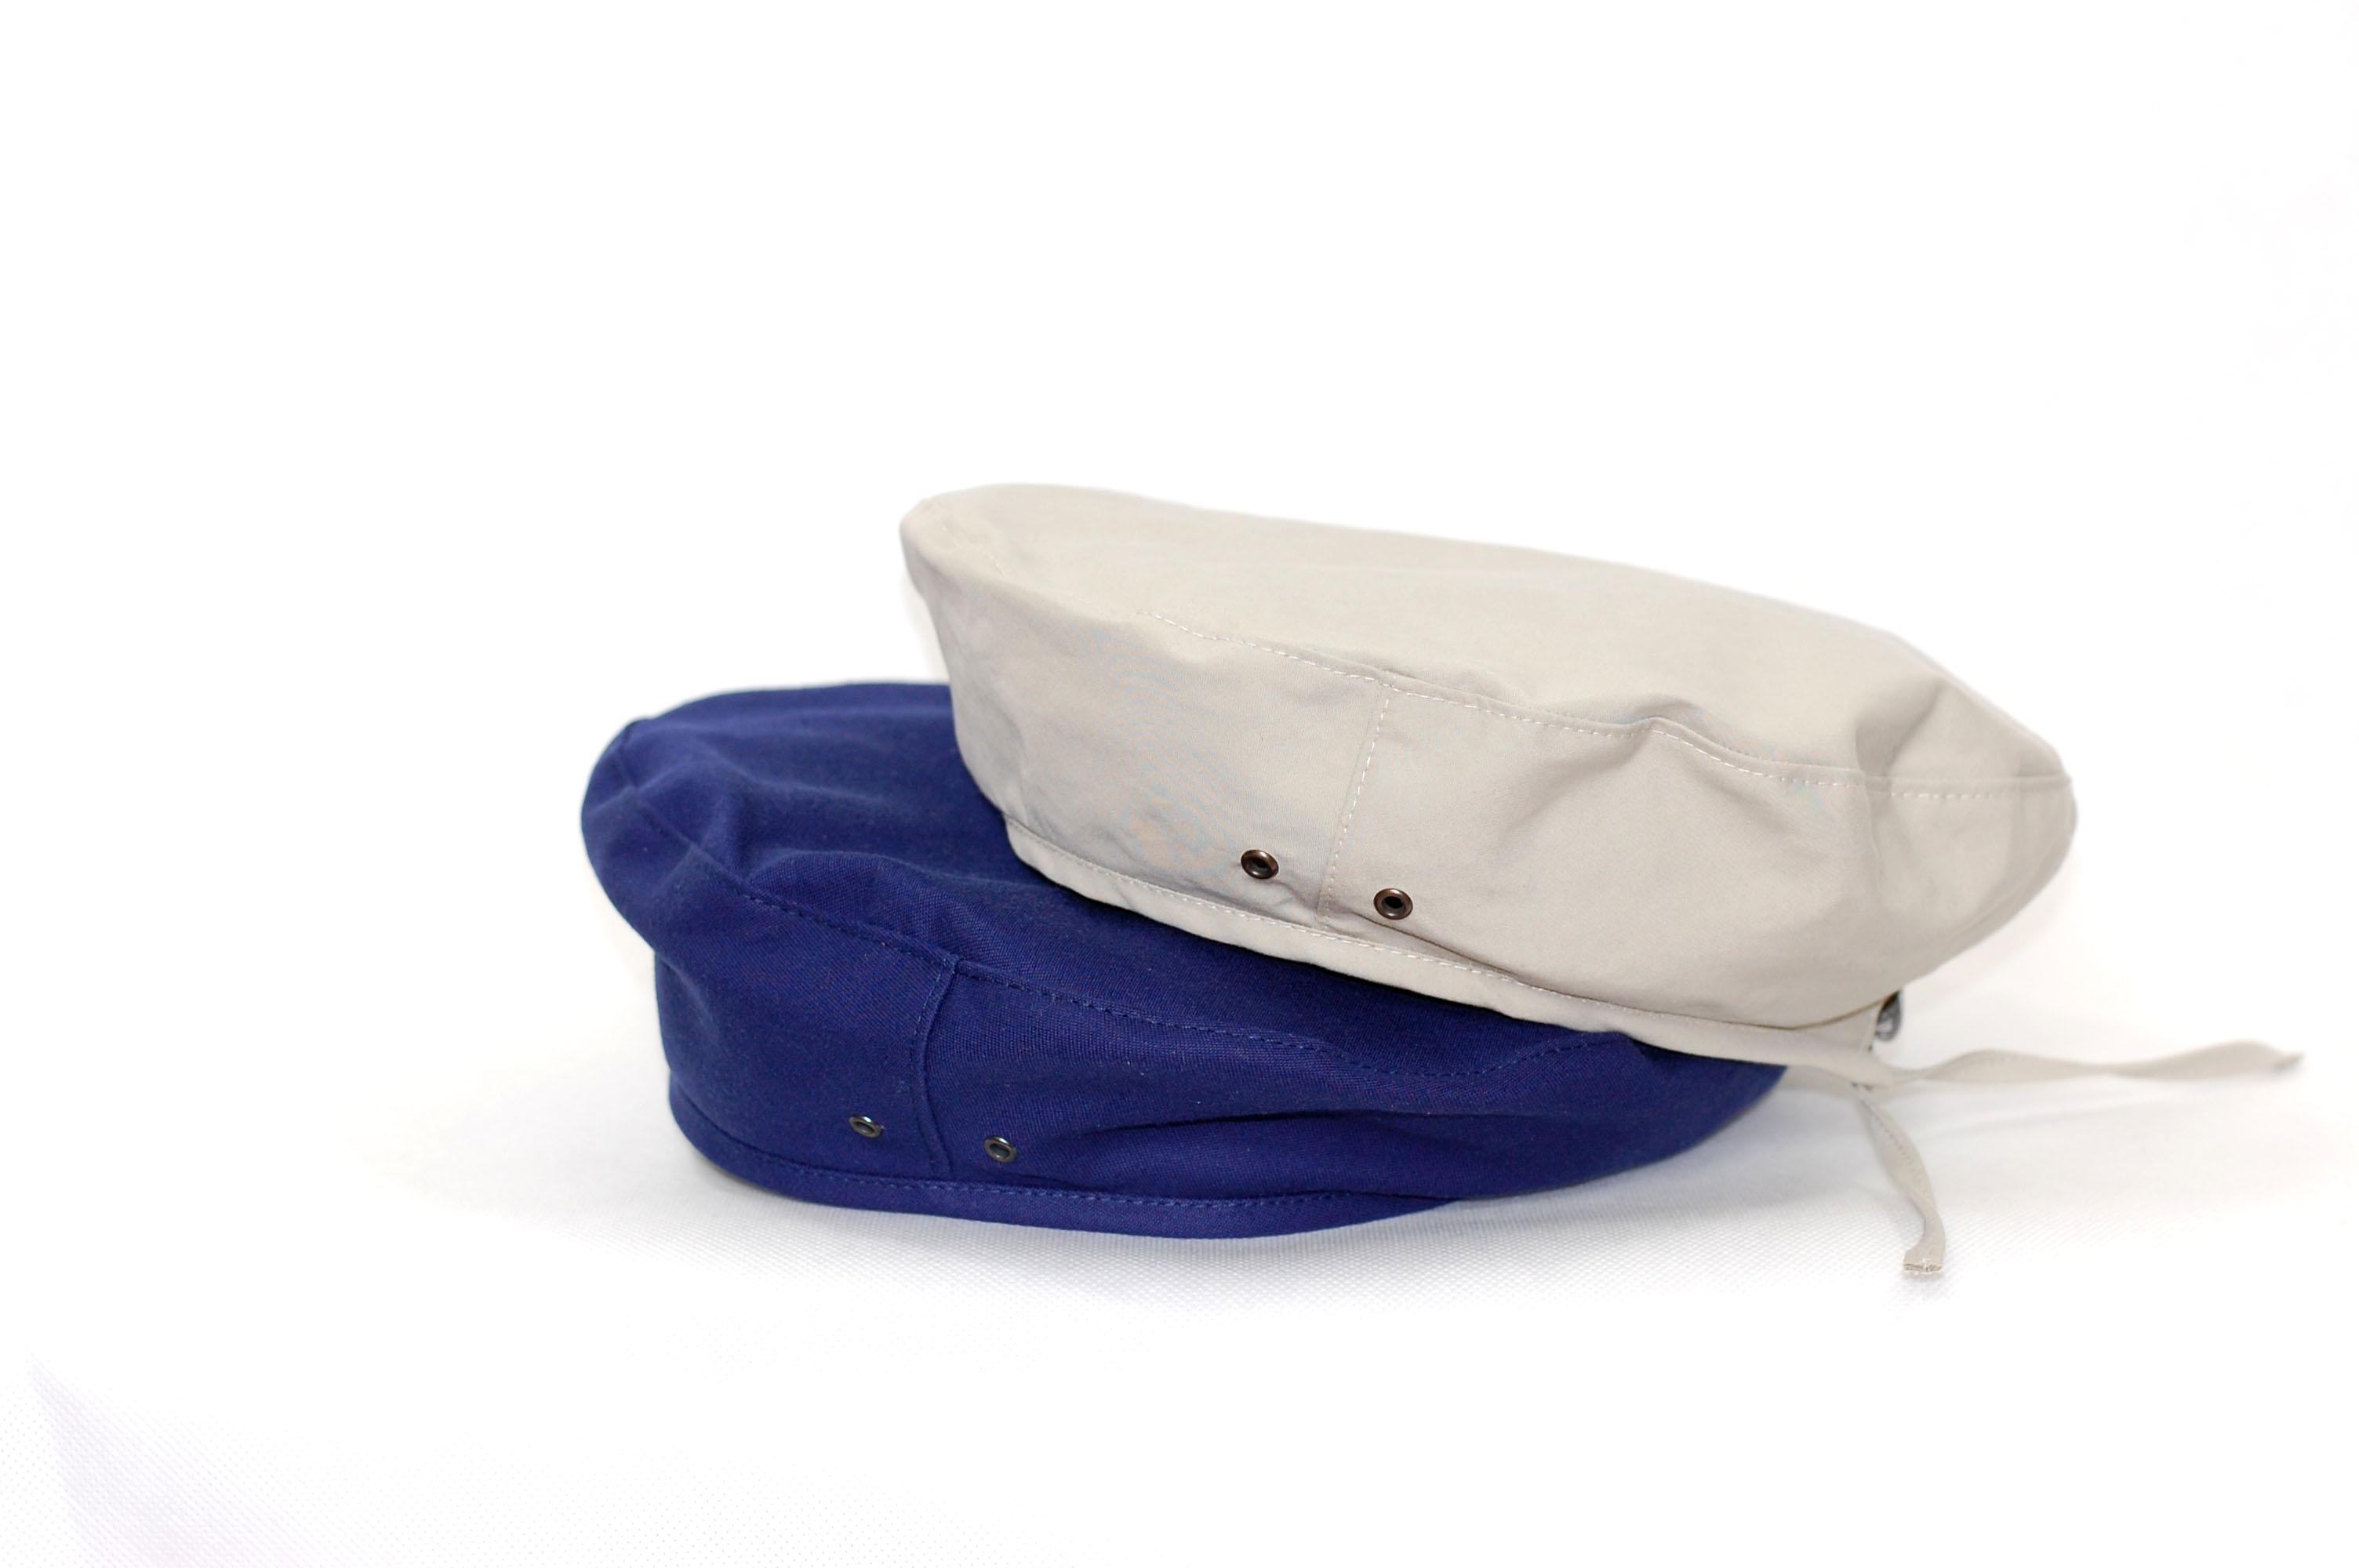 www.contractor48.com, fabrication locale, ventile hat